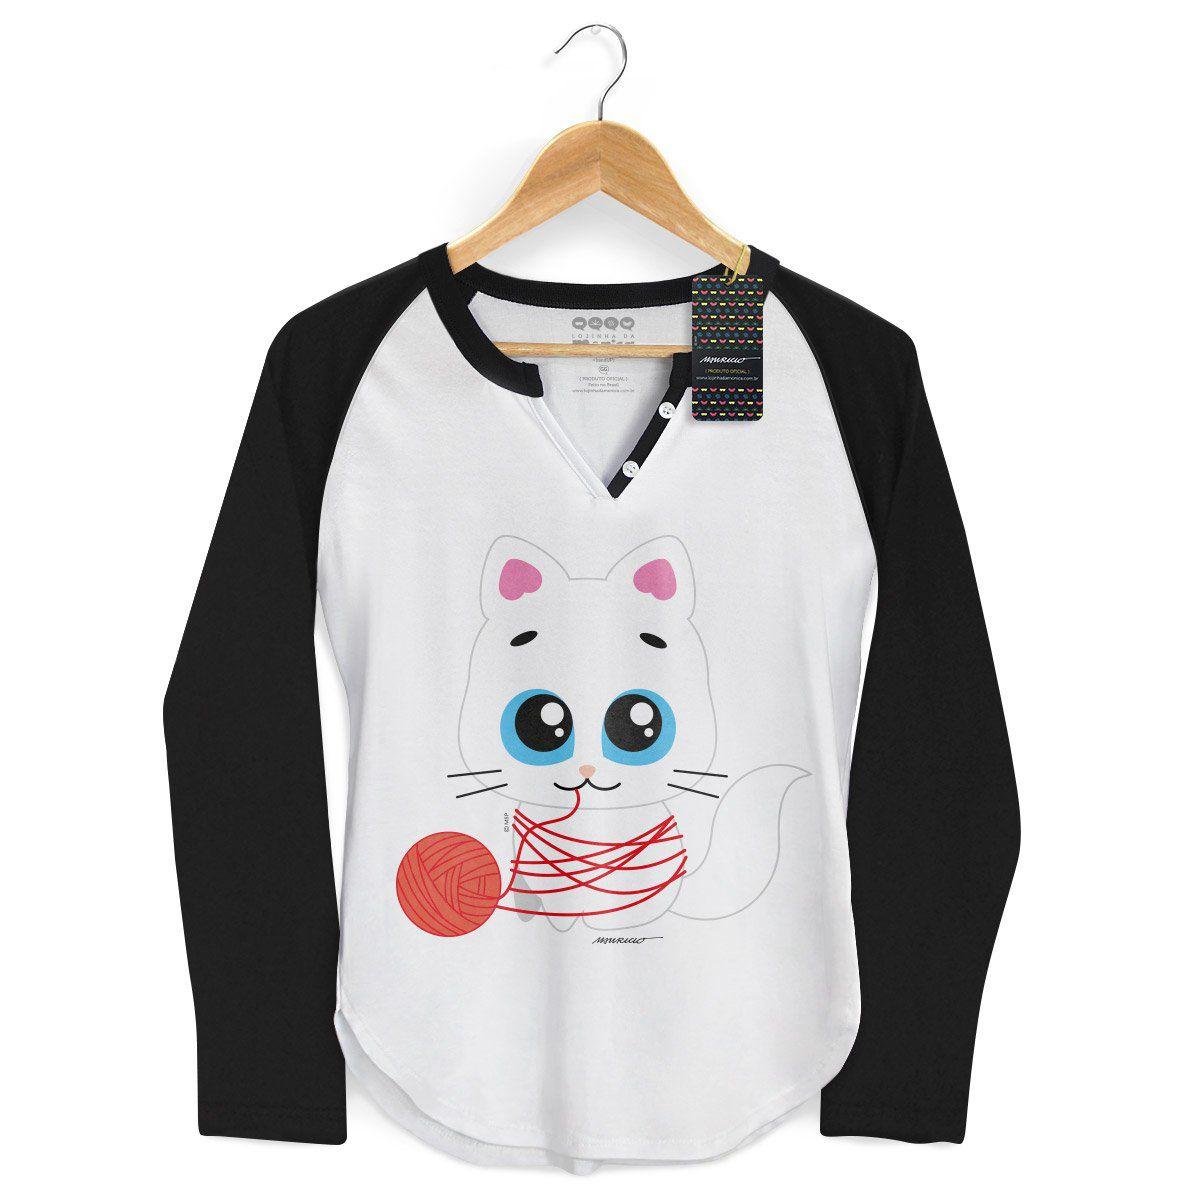 Camiseta Raglan Feminina Turma da Mônica Toy Mingau Lã